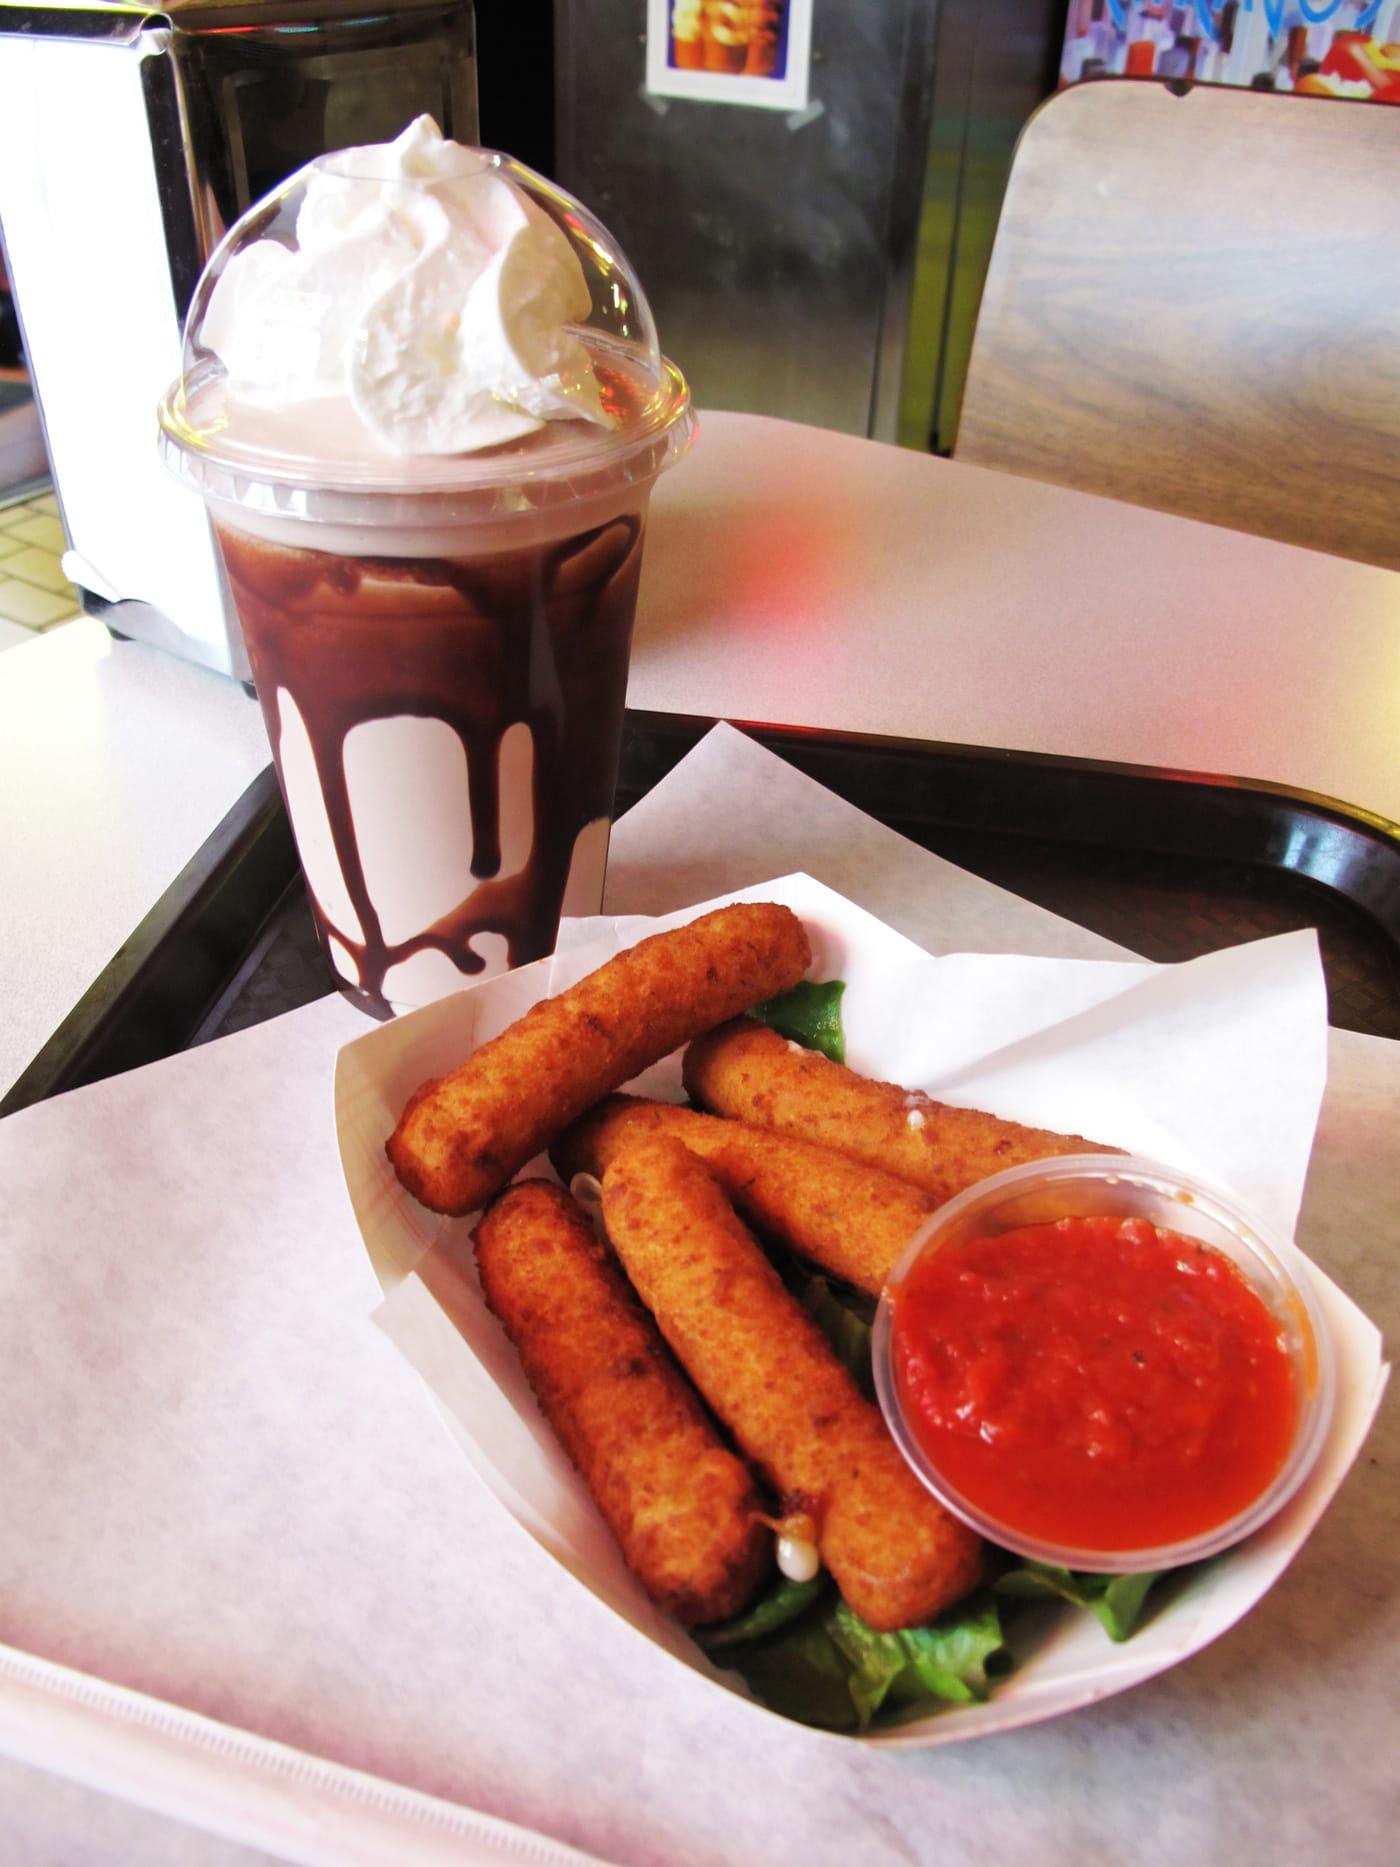 mozzarella sticks and a chocolate milkshake at the Bunny Hutch